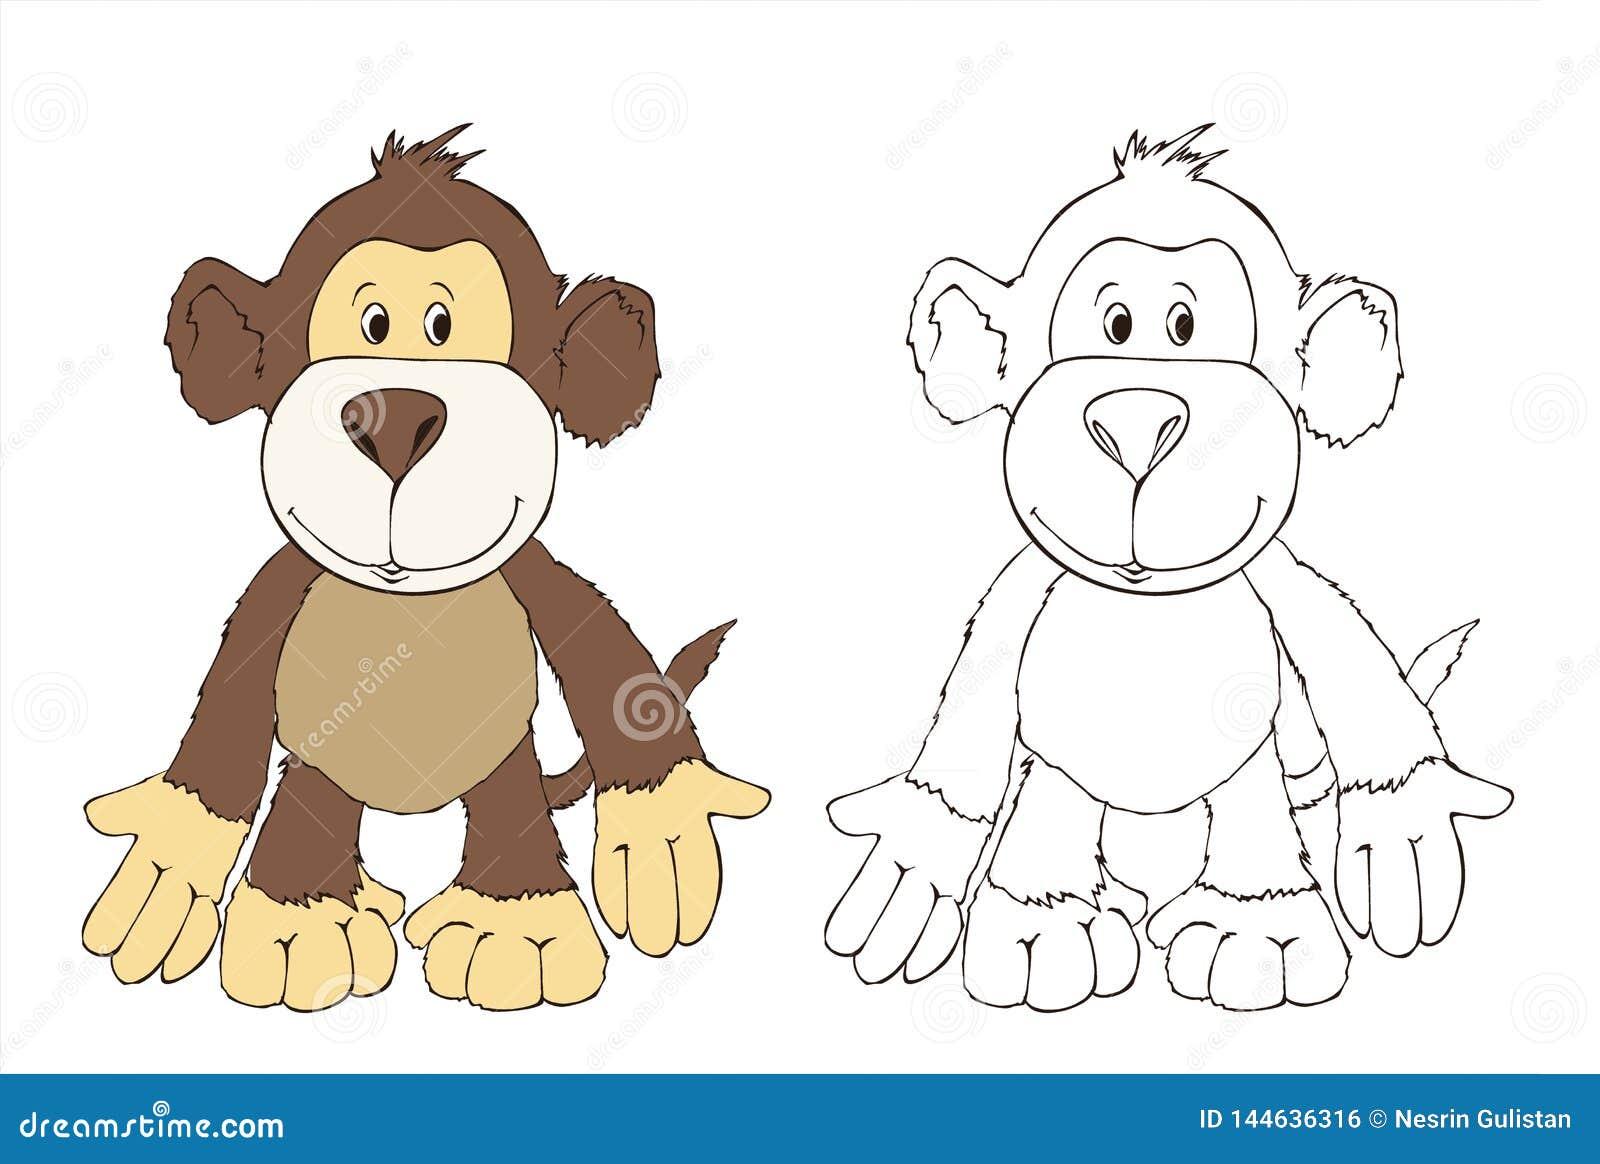 Cute Monkey Friend , Toy Monkey, Coloring Book Illustration ...